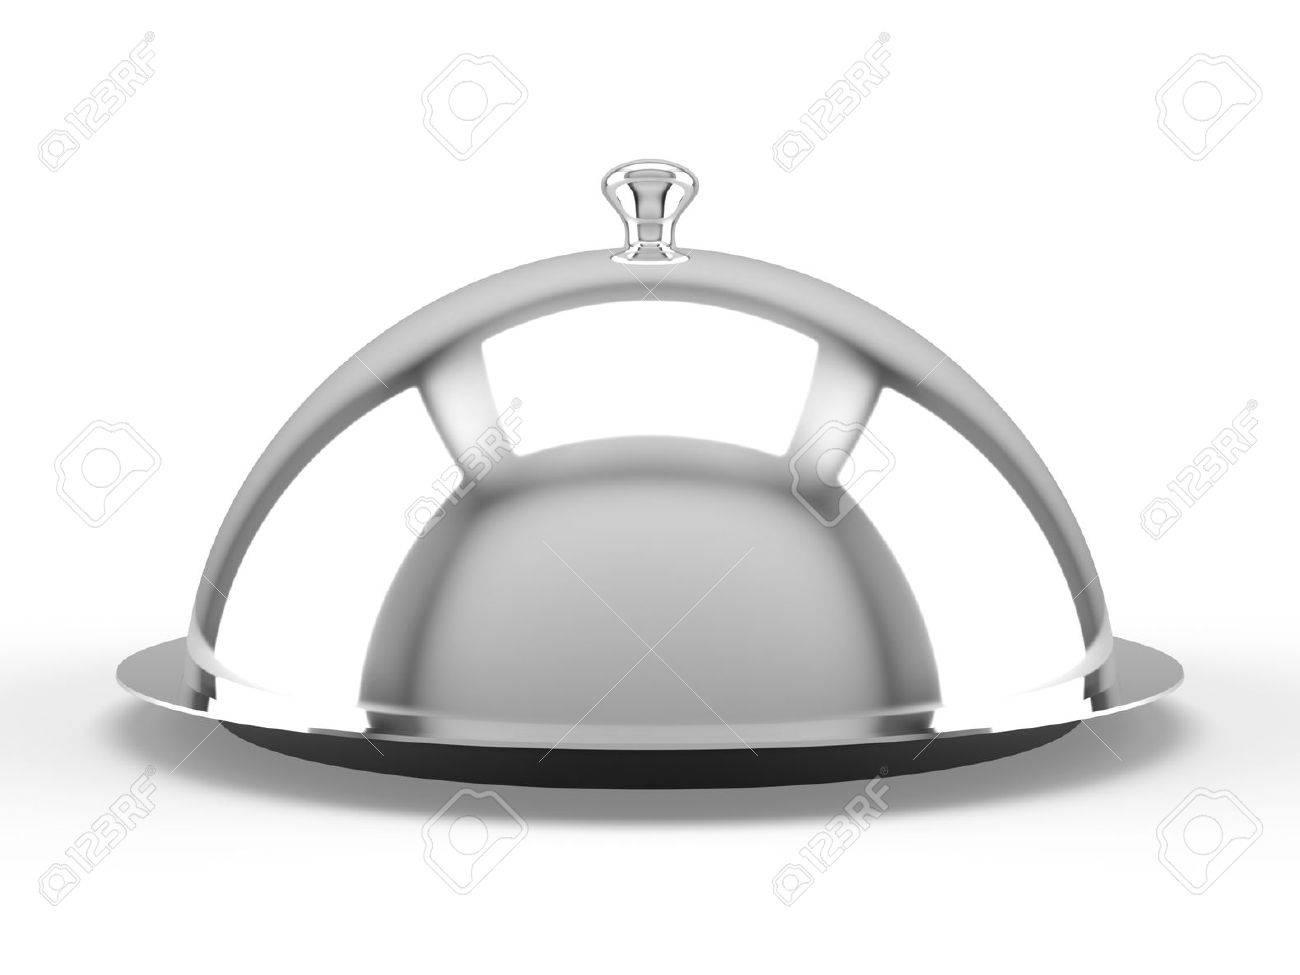 Restaurant cloche on white background Stock Photo - 11962375